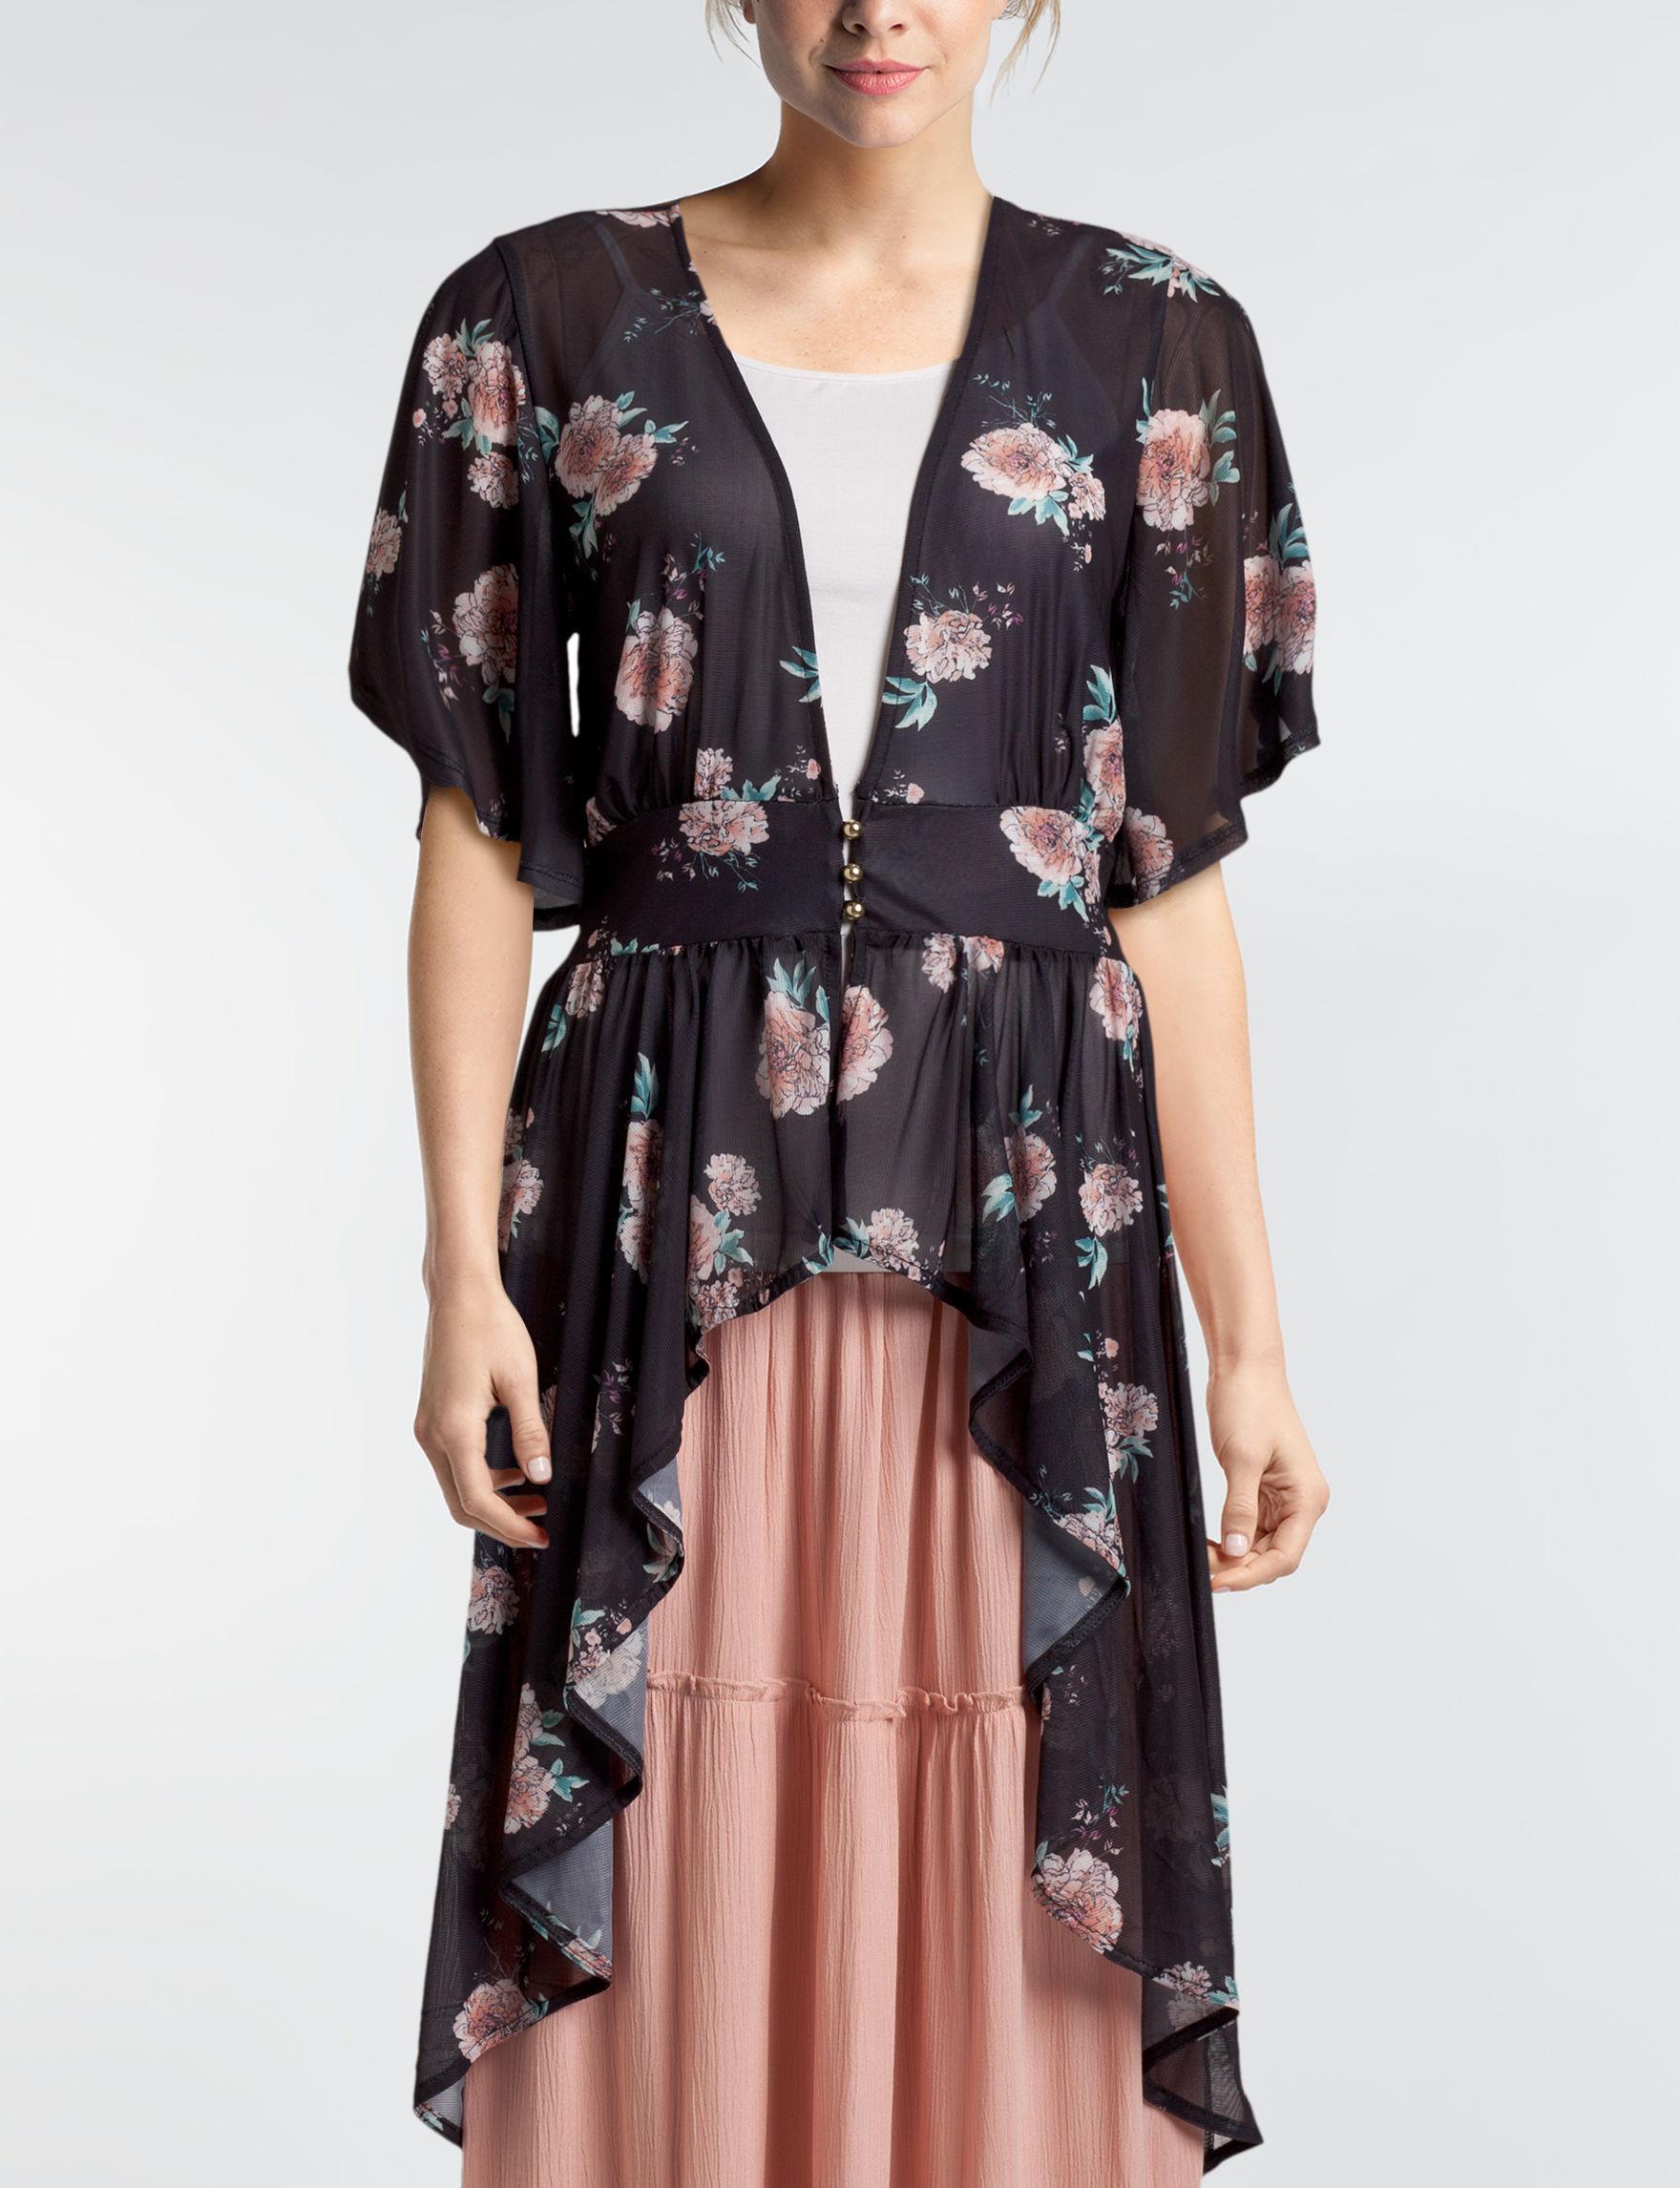 Liberty Love Black Floral